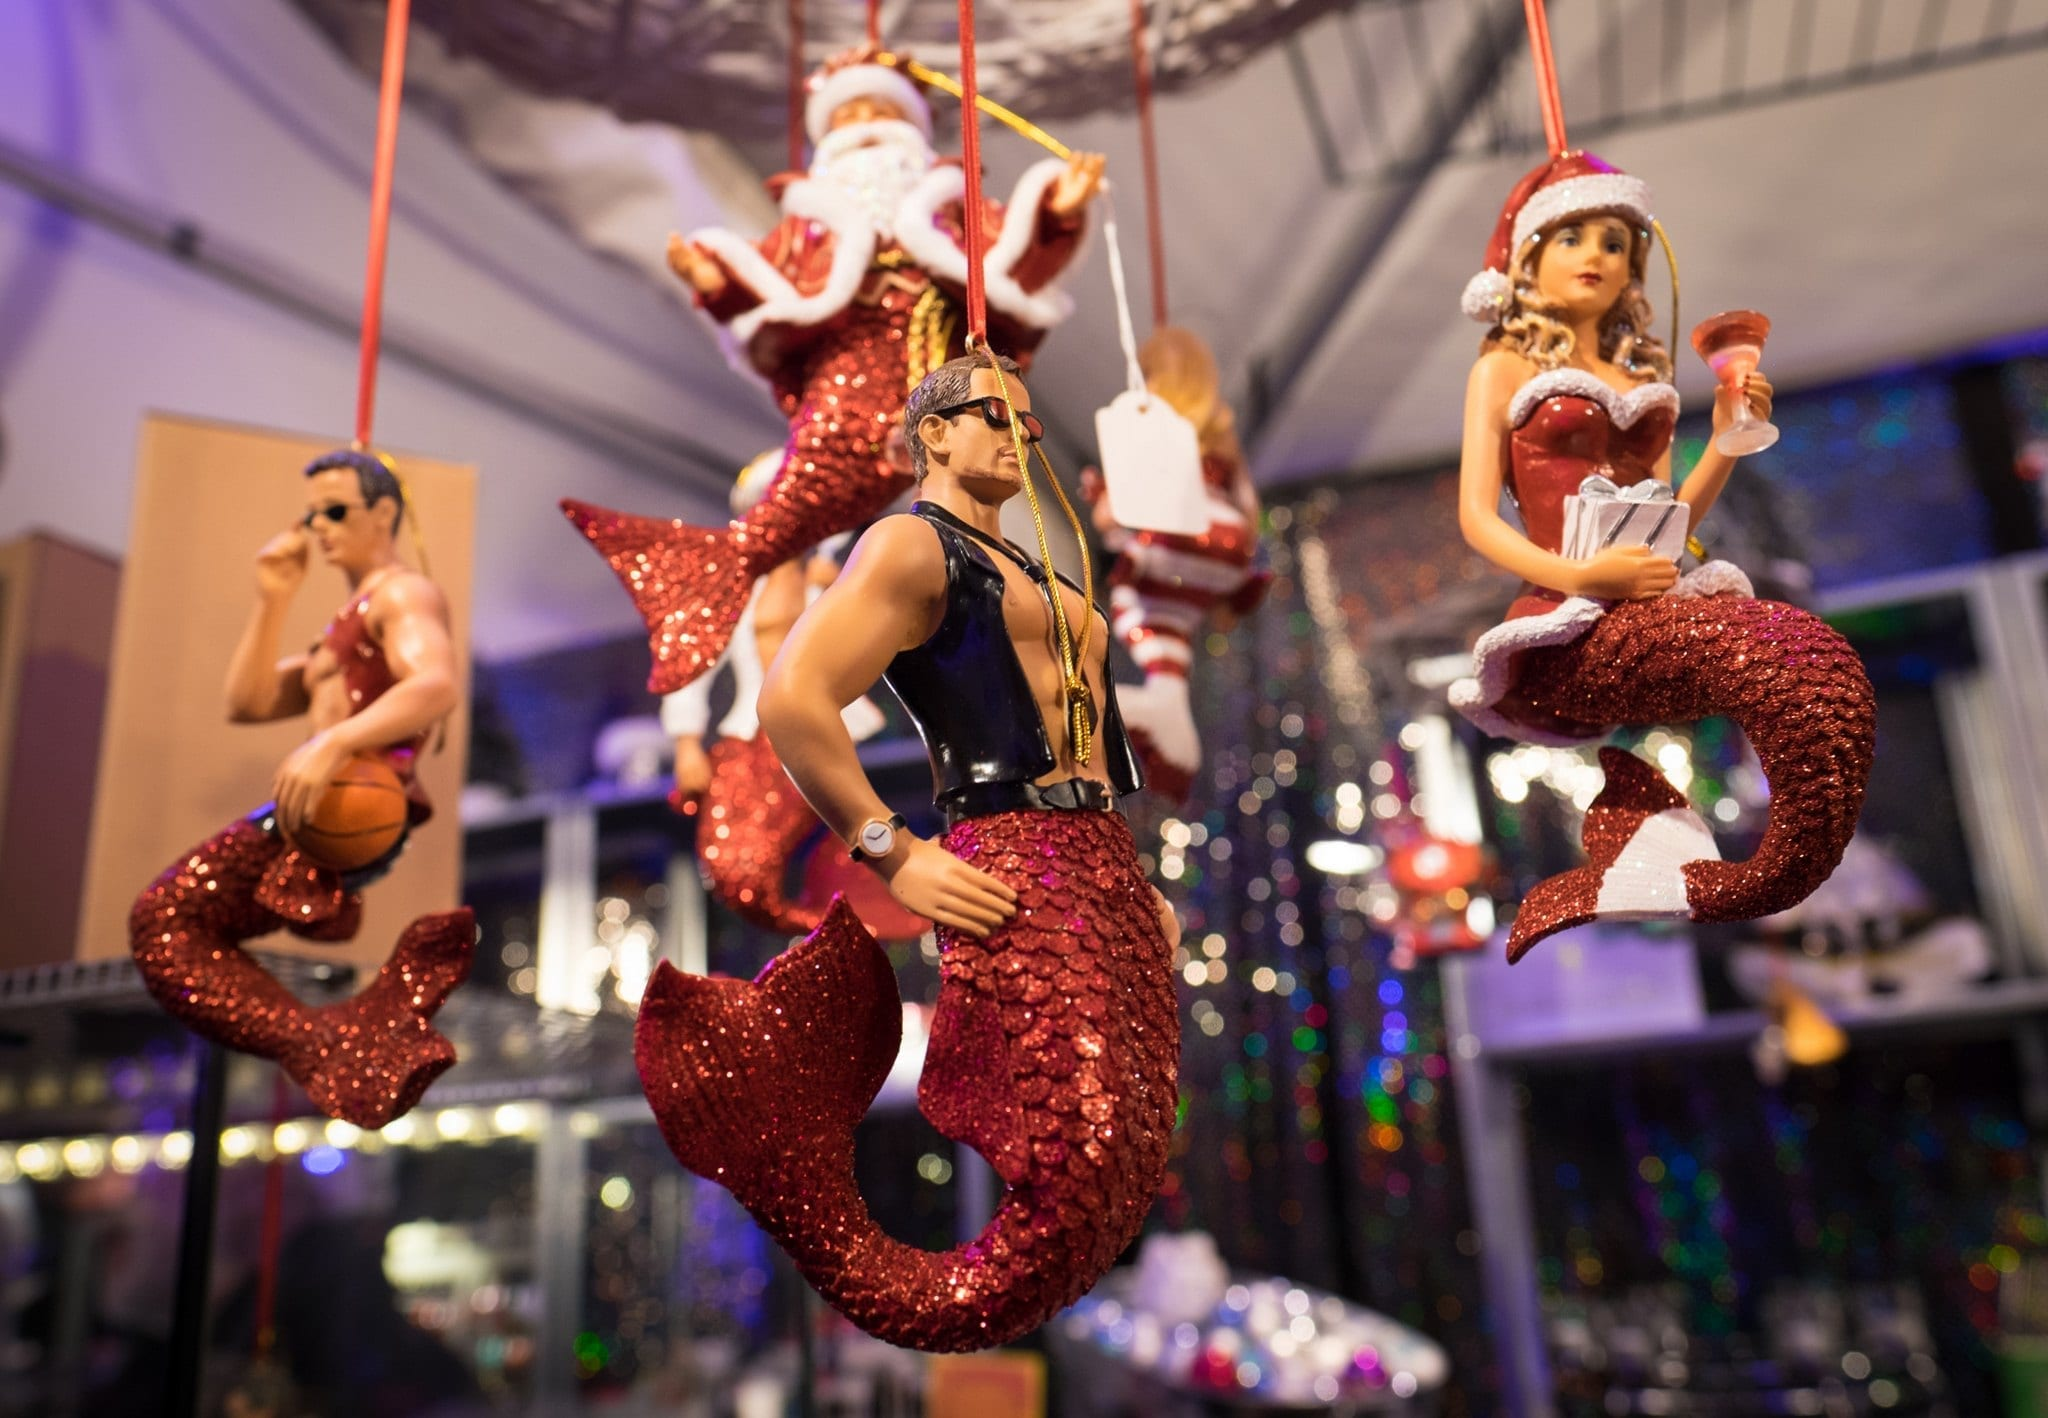 Sexy Mermen Ornaments Christmas in Bavaria